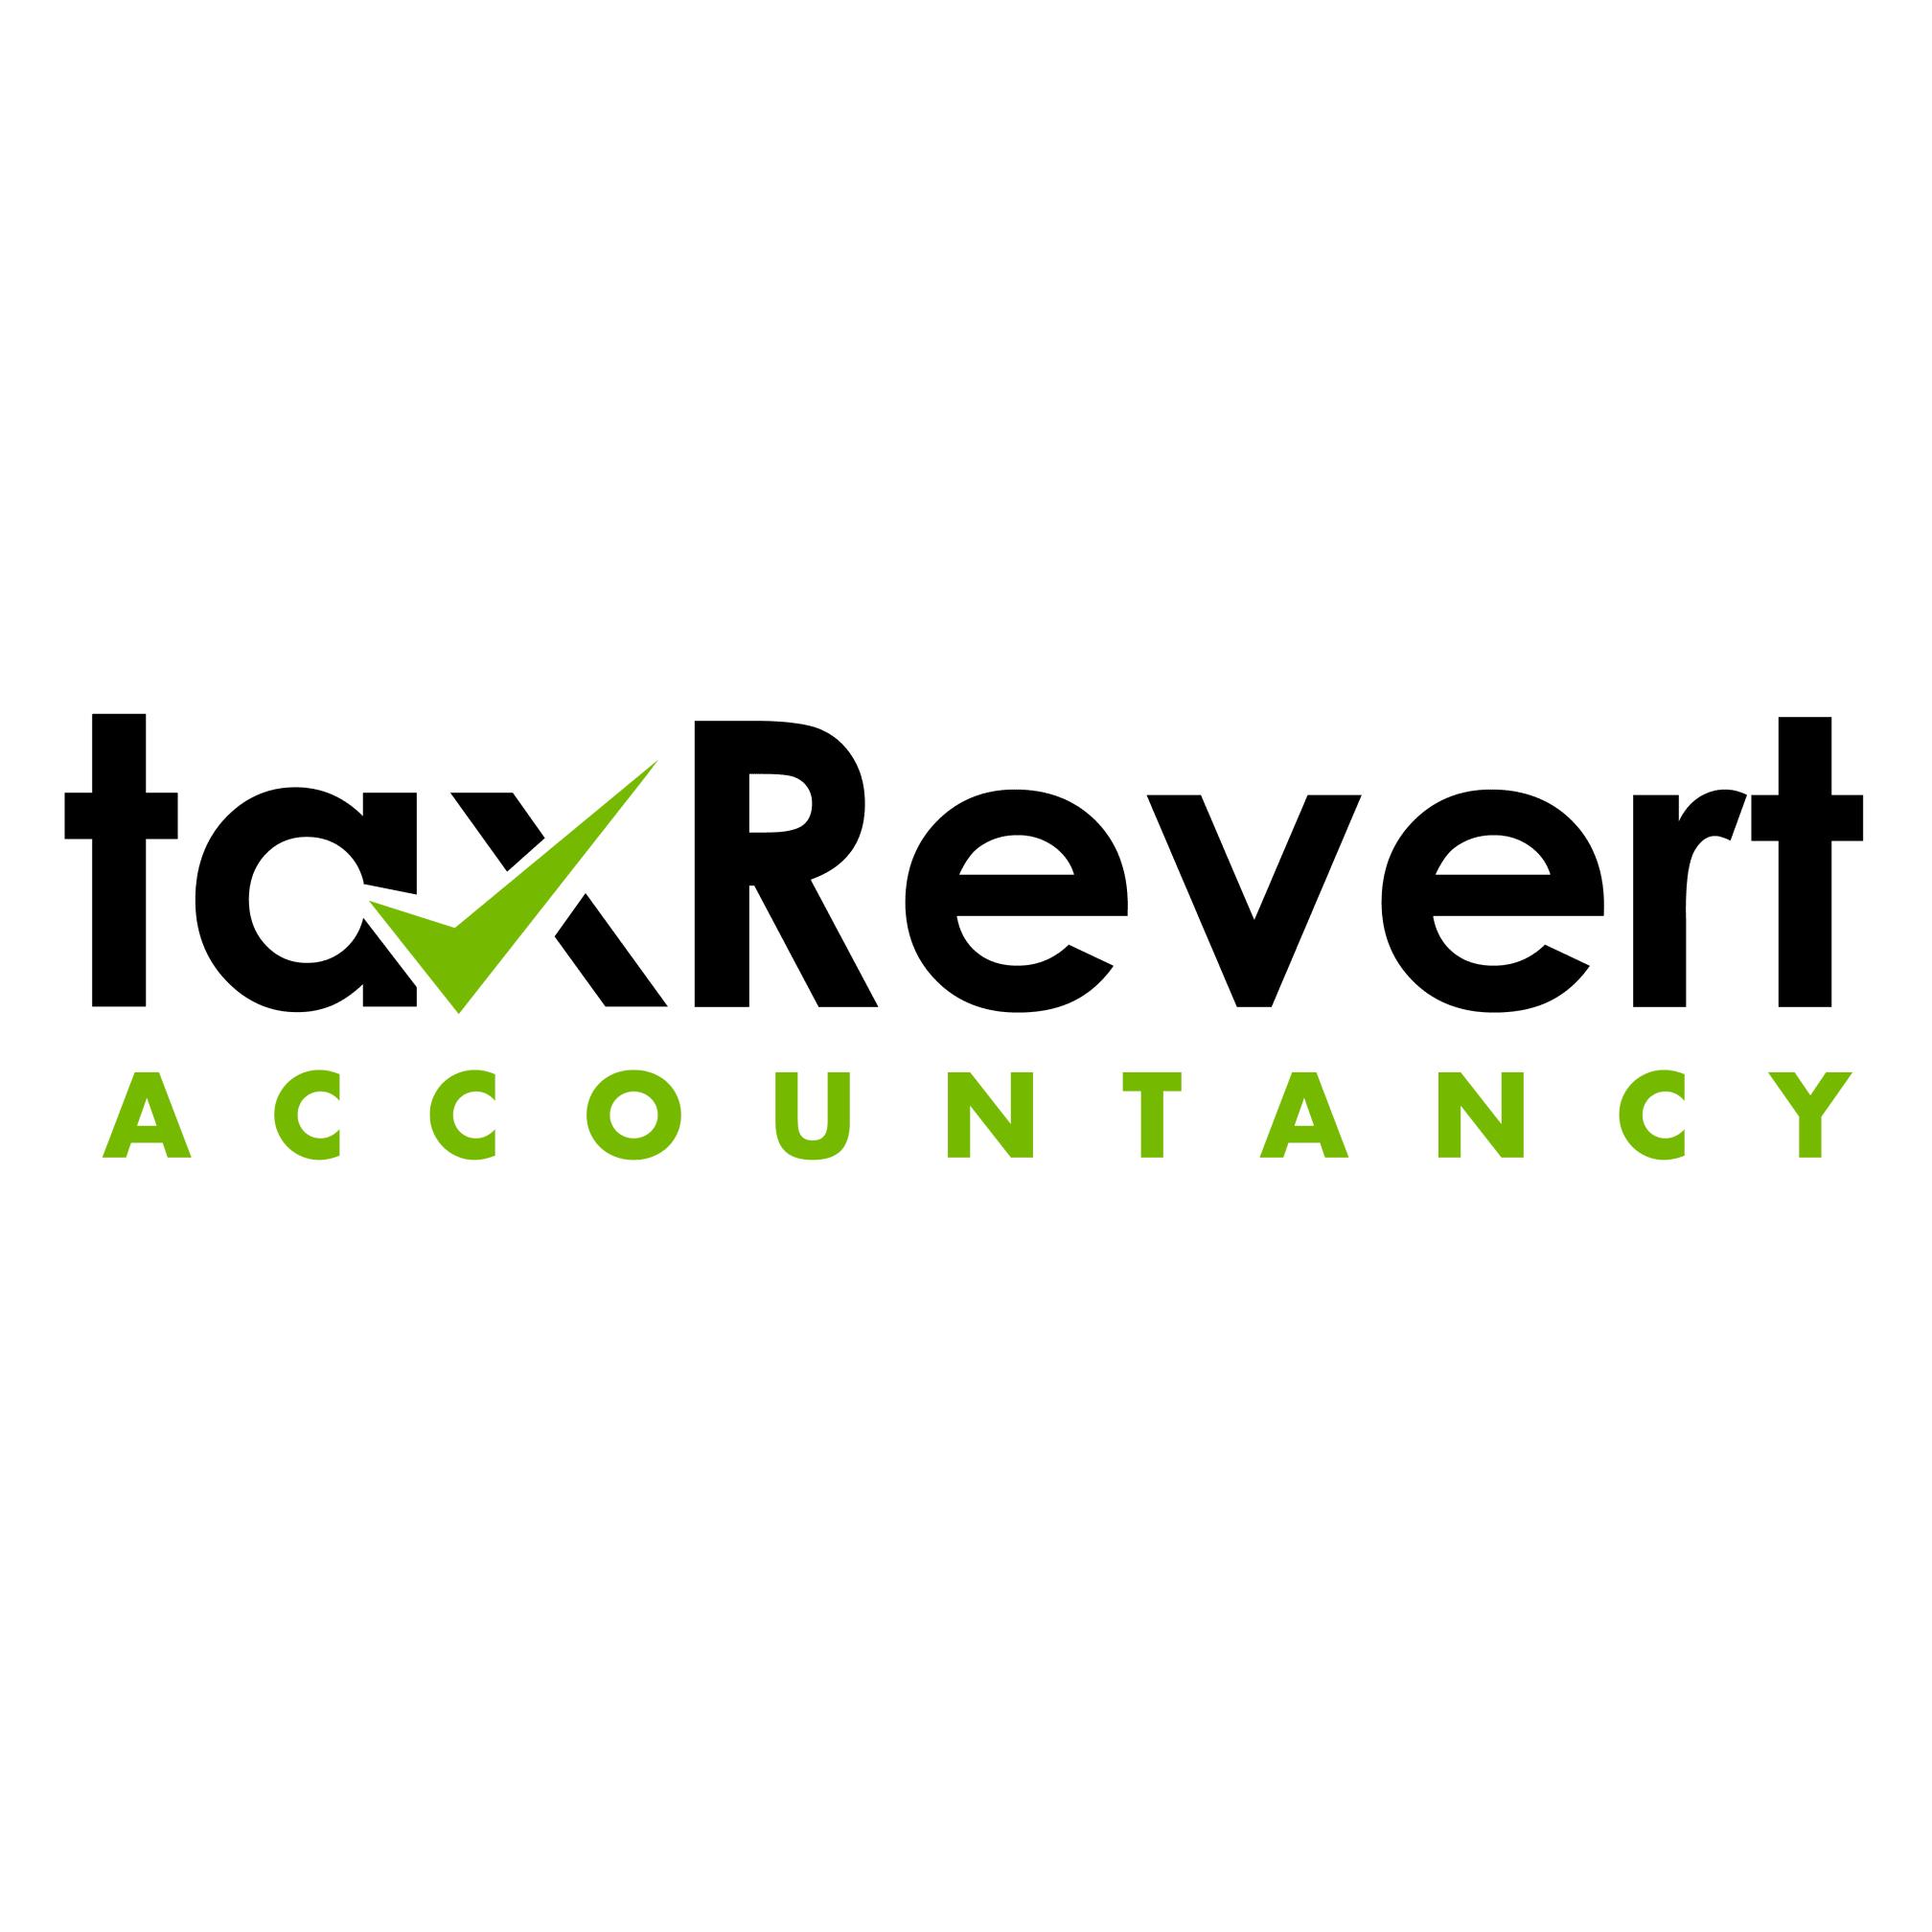 Tax Revert Accountancy Services